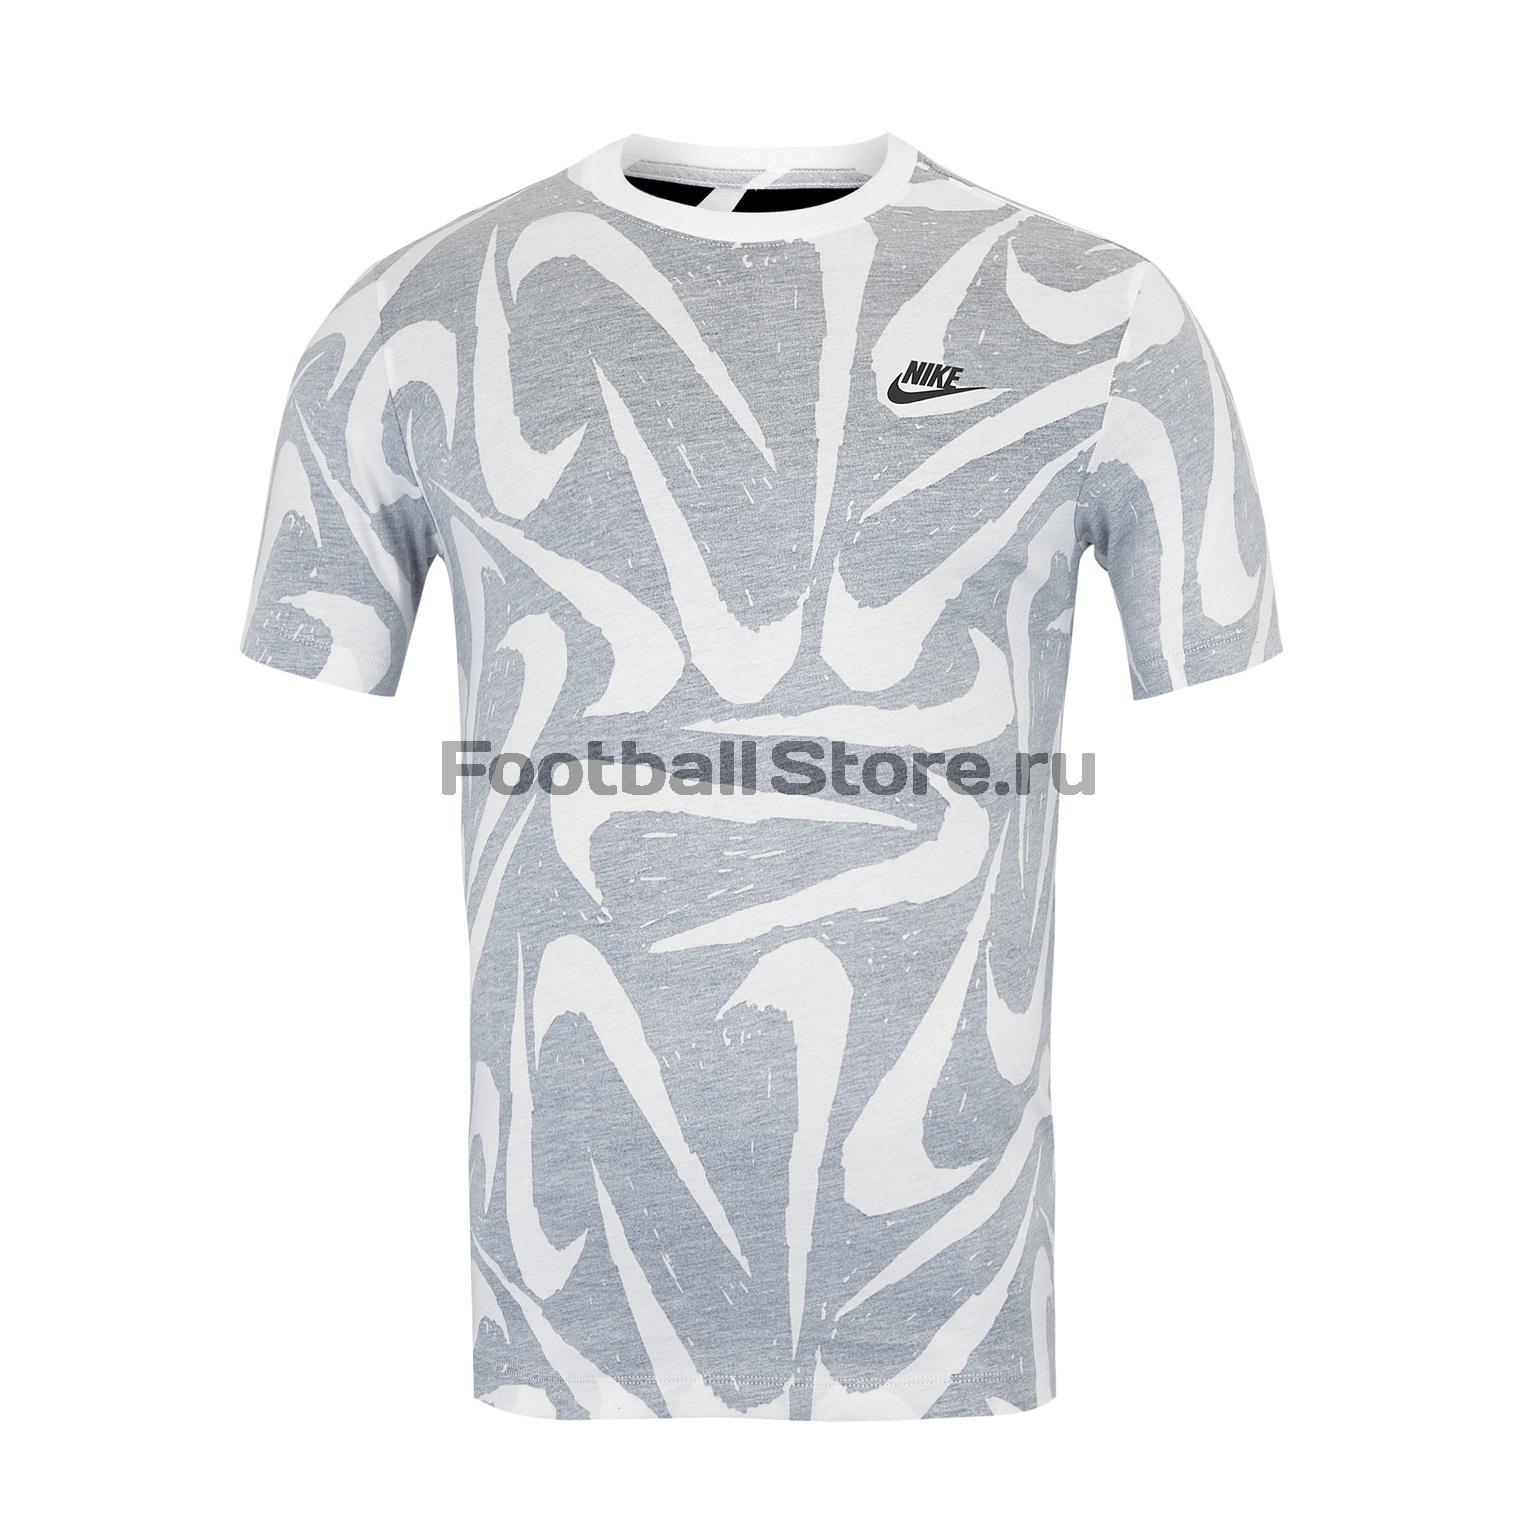 Футболка Nike Hand Drawn Aop Tee CK2375-010